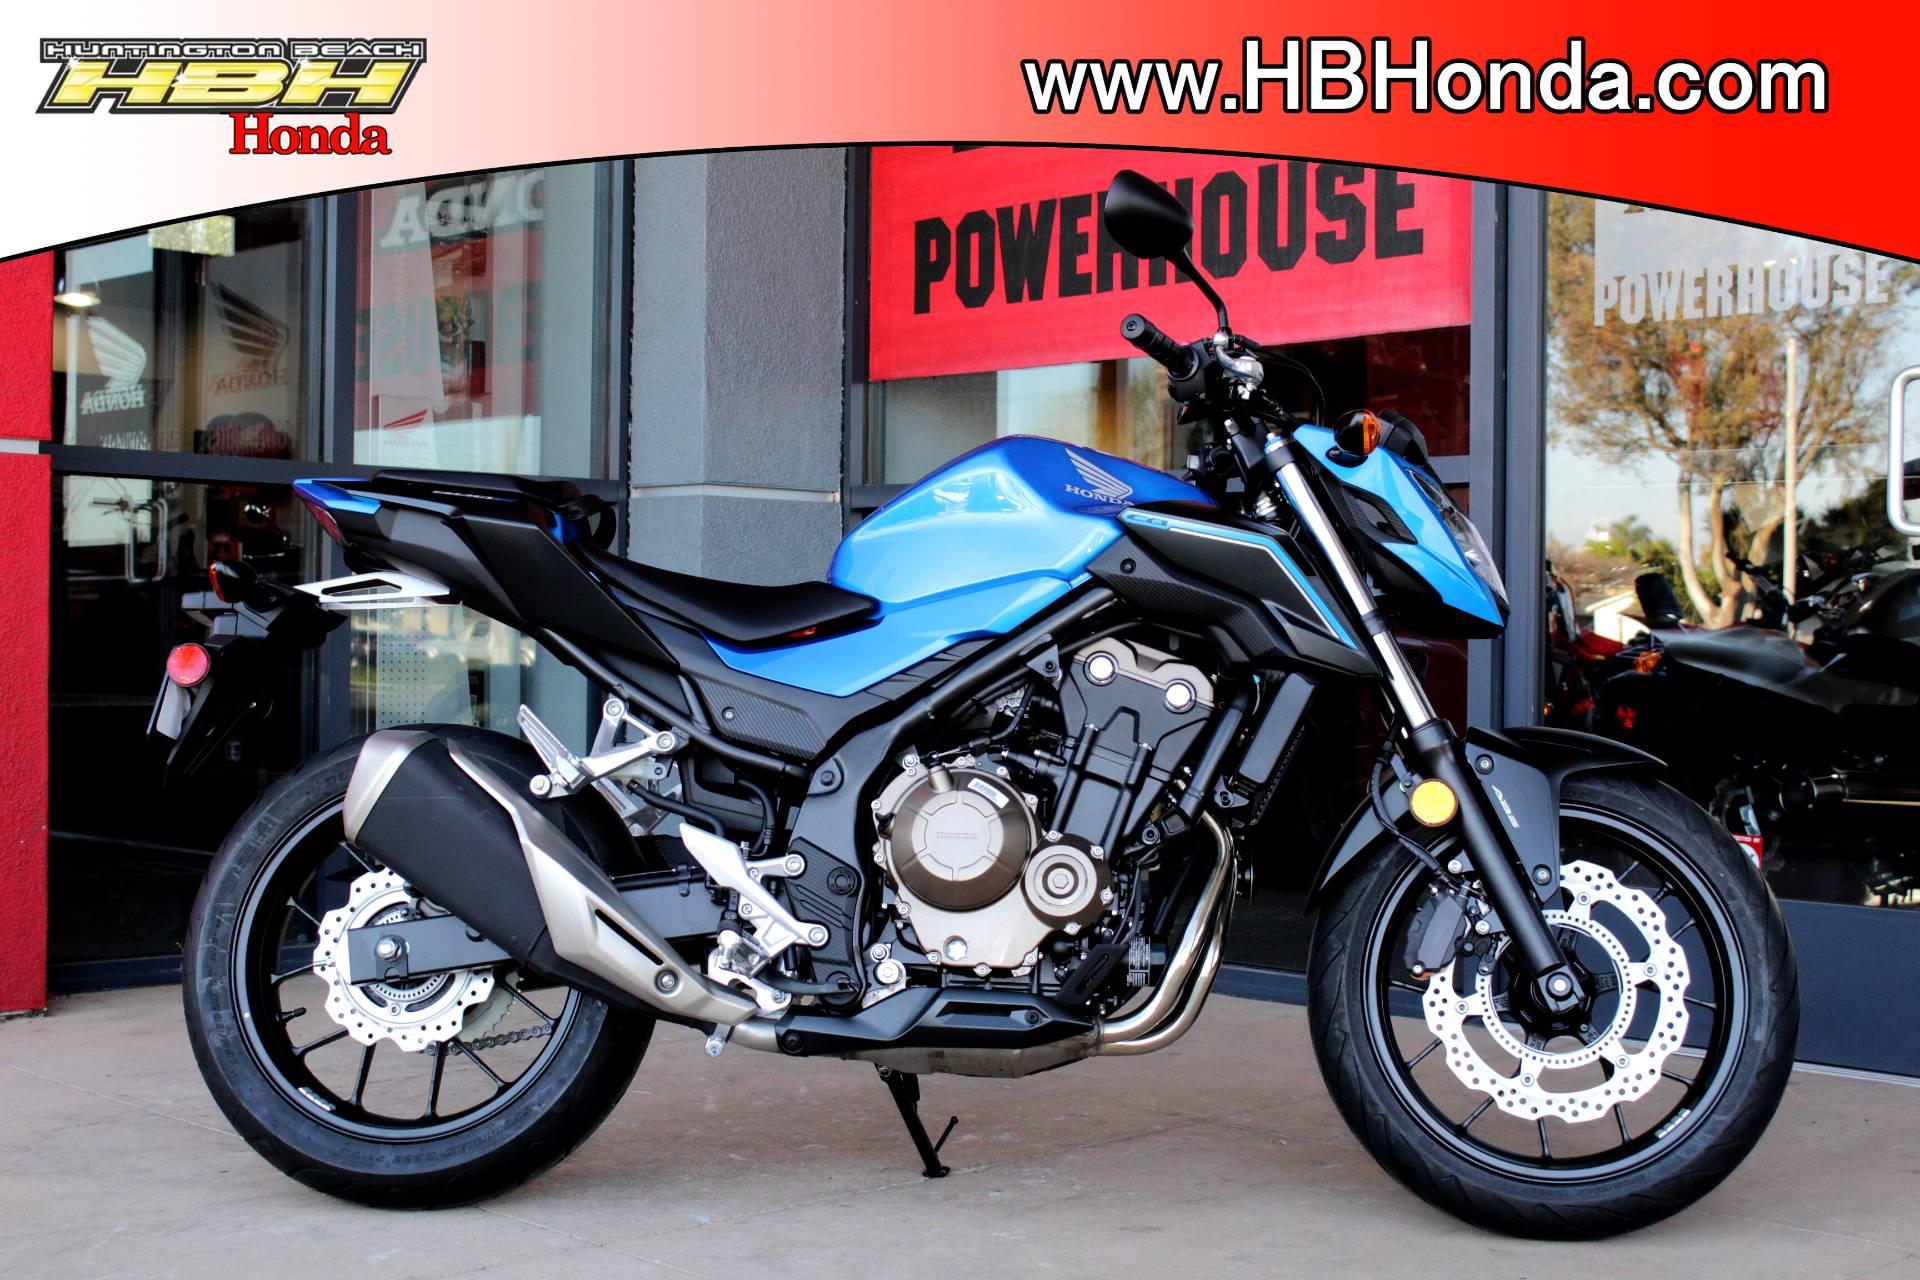 New 2018 Honda Cb500f Motorcycles For Sale In Huntington Beach Ca History California